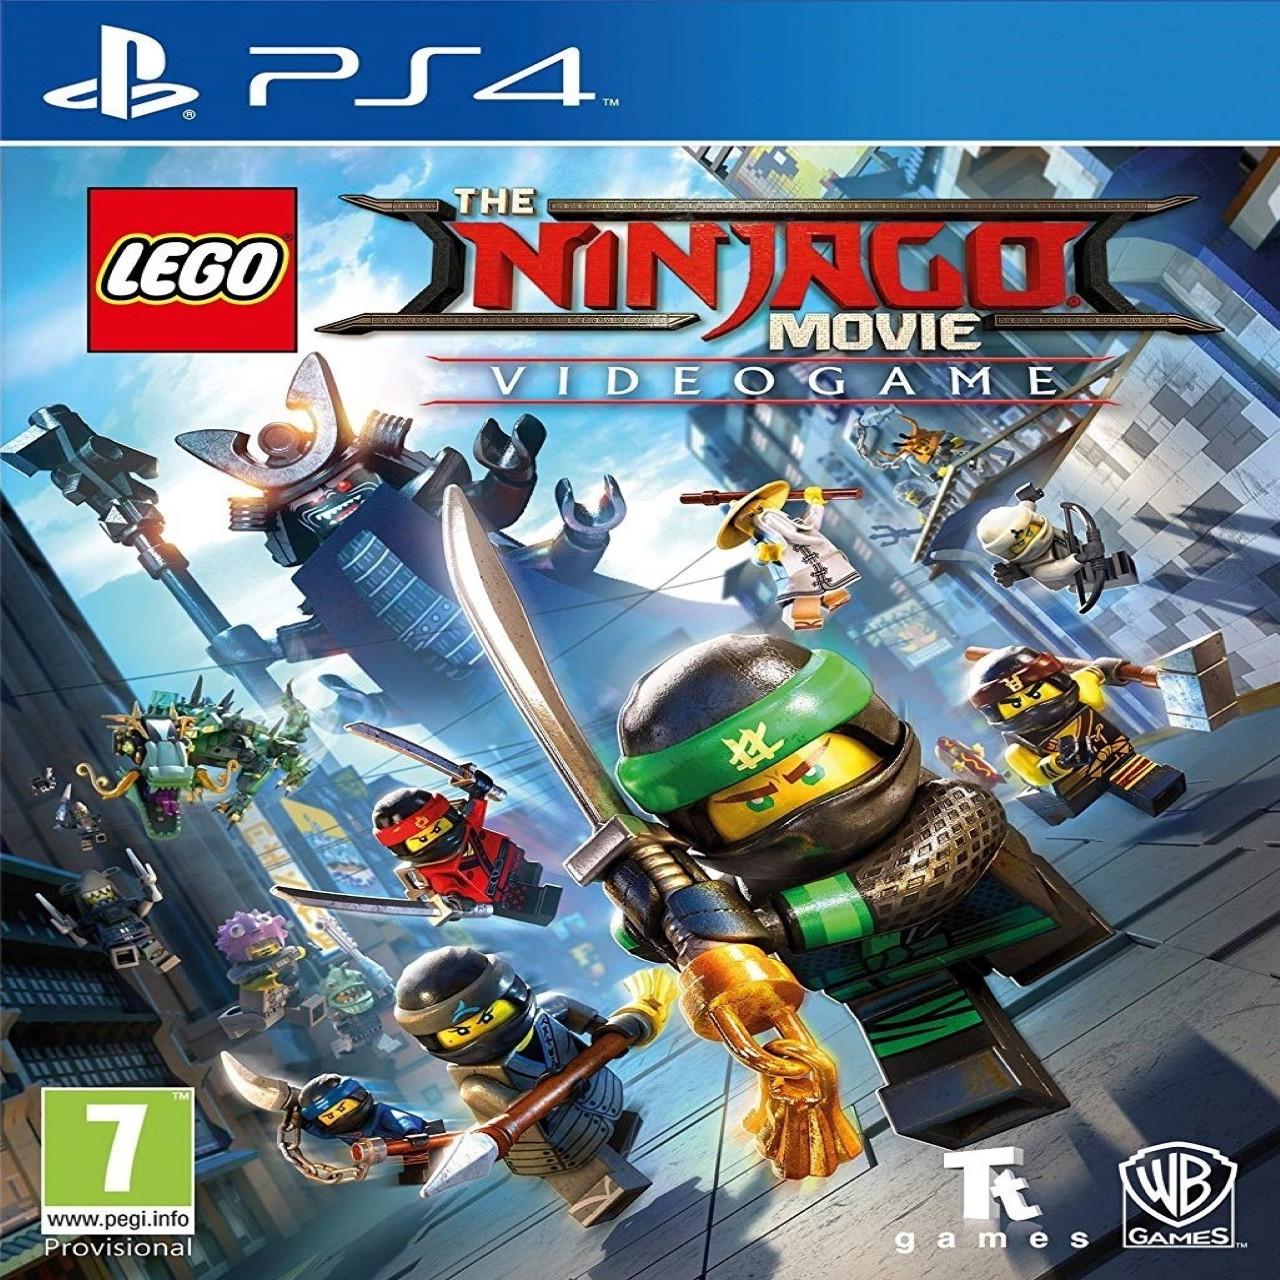 Lego Ninjago Movie Videogame SUB PS4 (NEW)